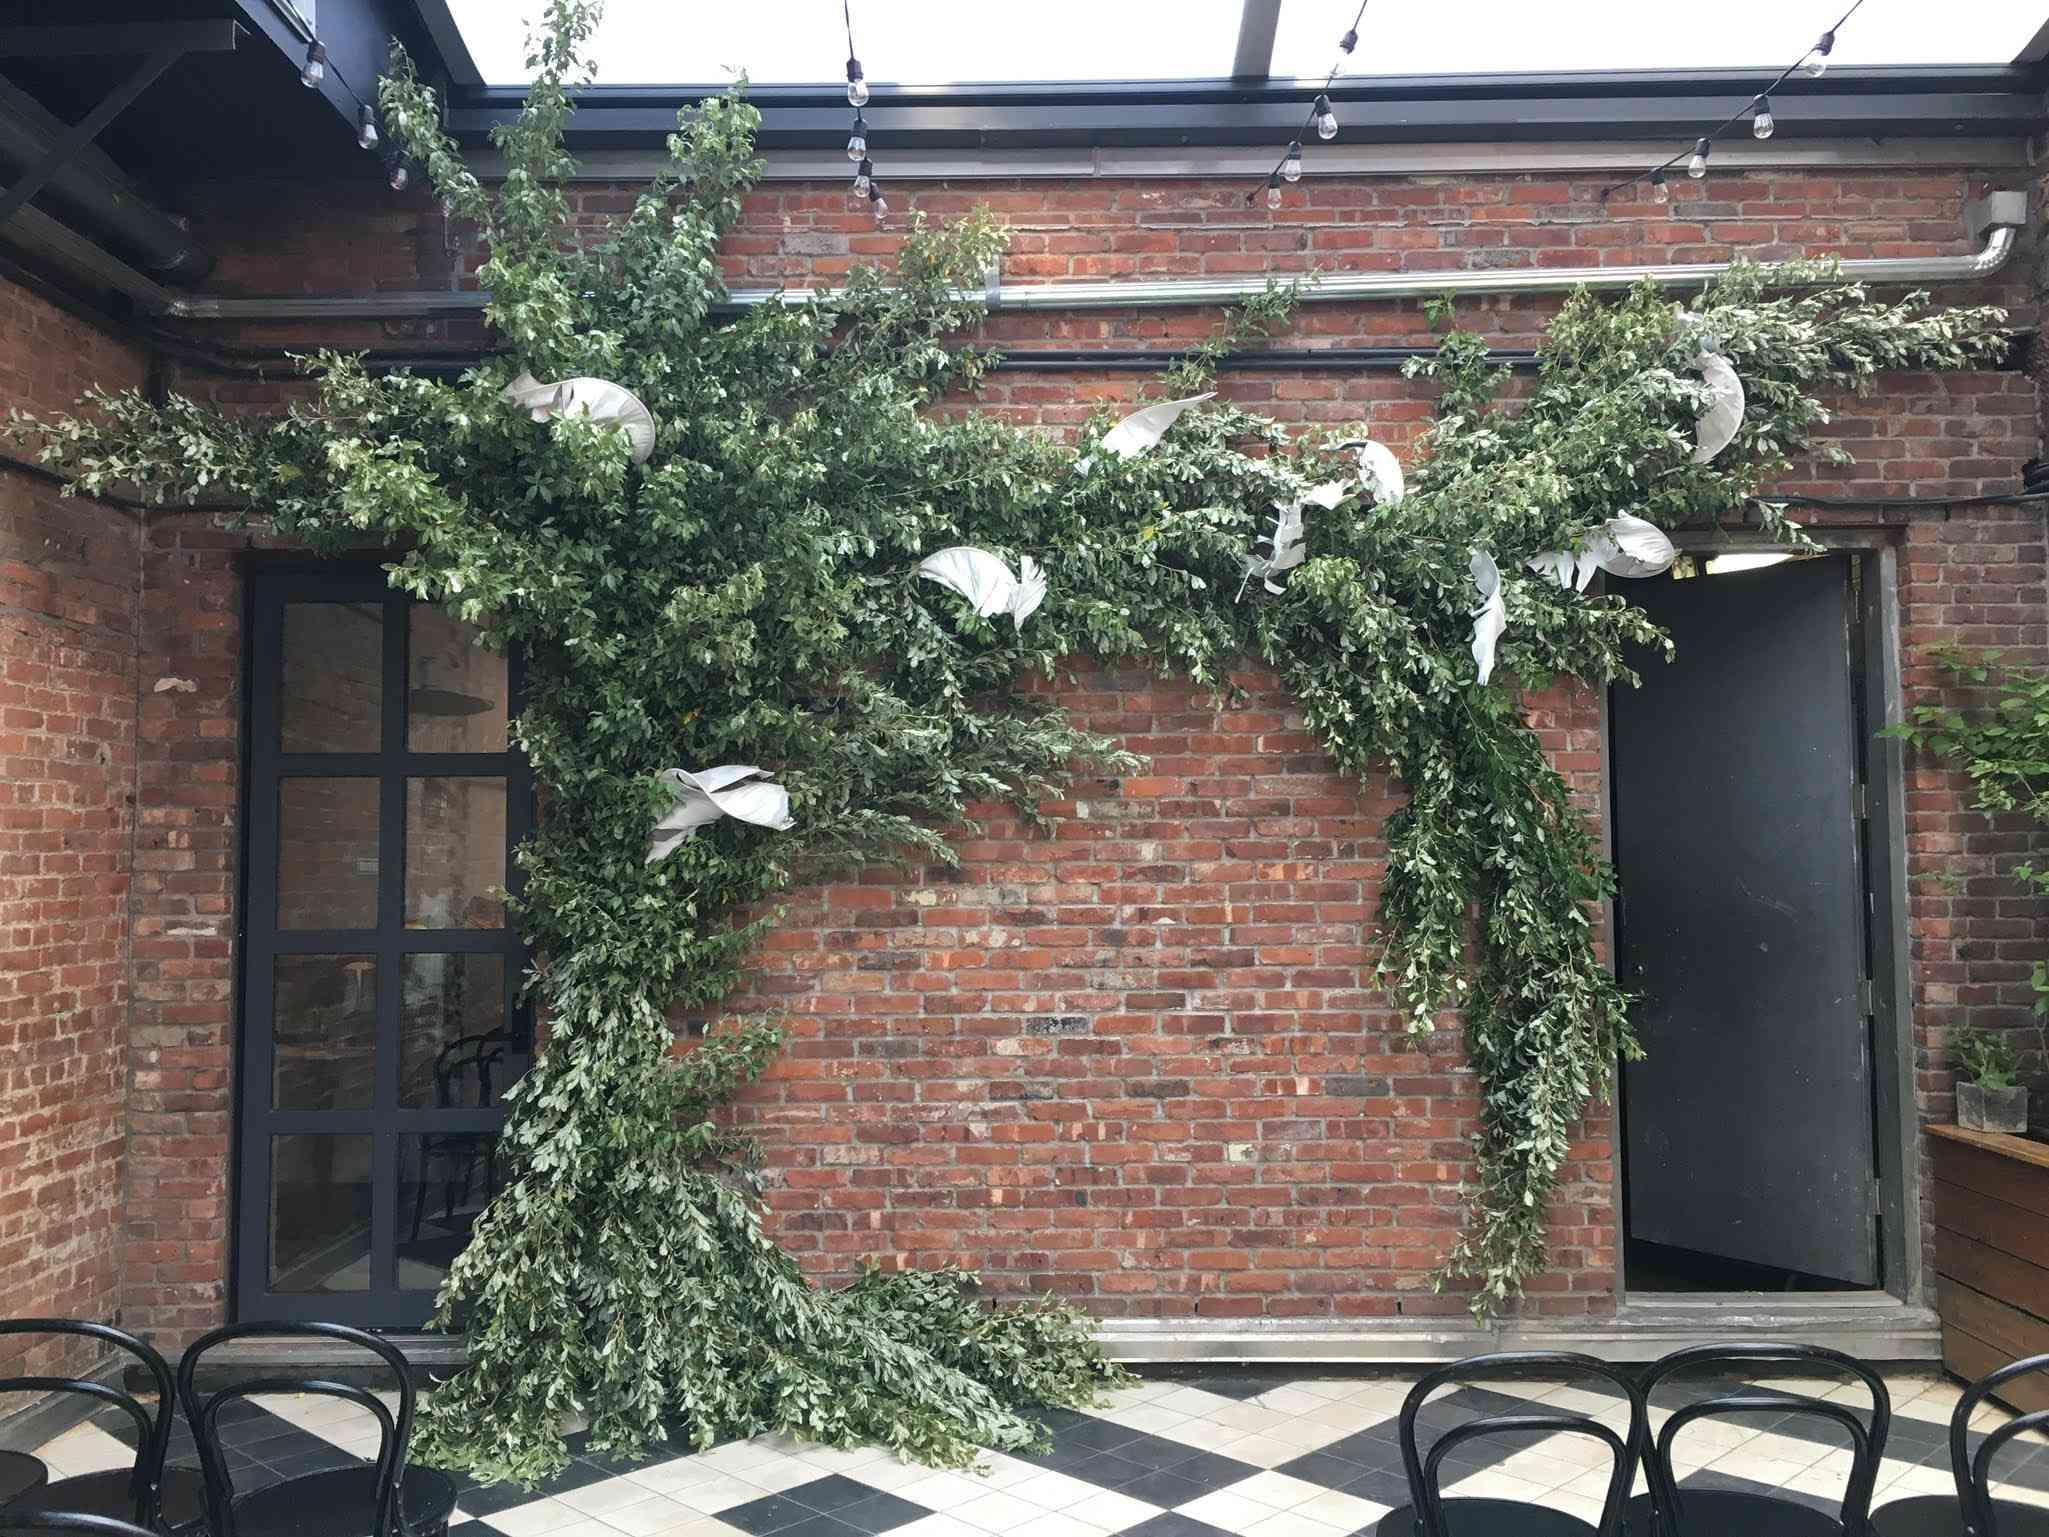 Asymmetric floral arch